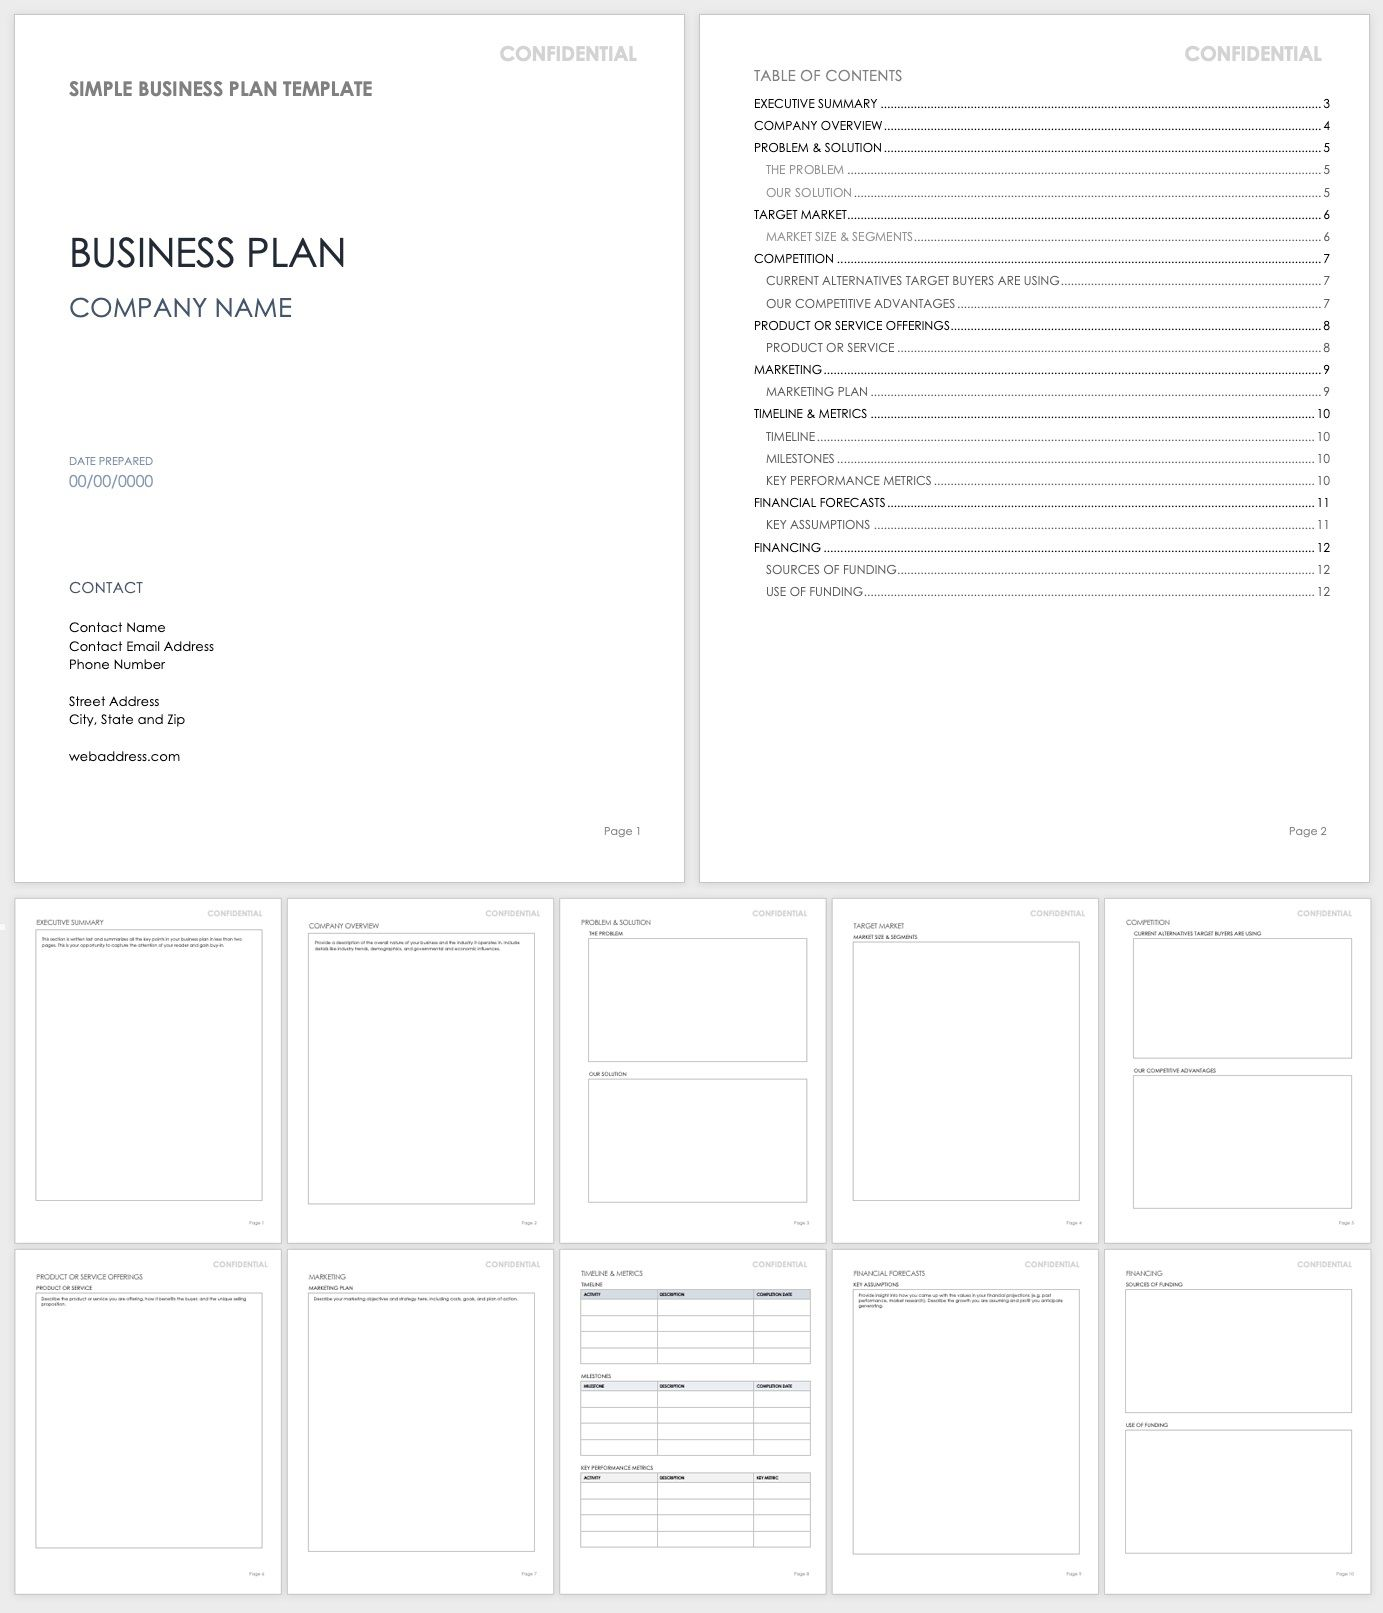 007 Shocking Basic Busines Plan Template High Resolution  Simple Word Download Easy Free AustraliaFull